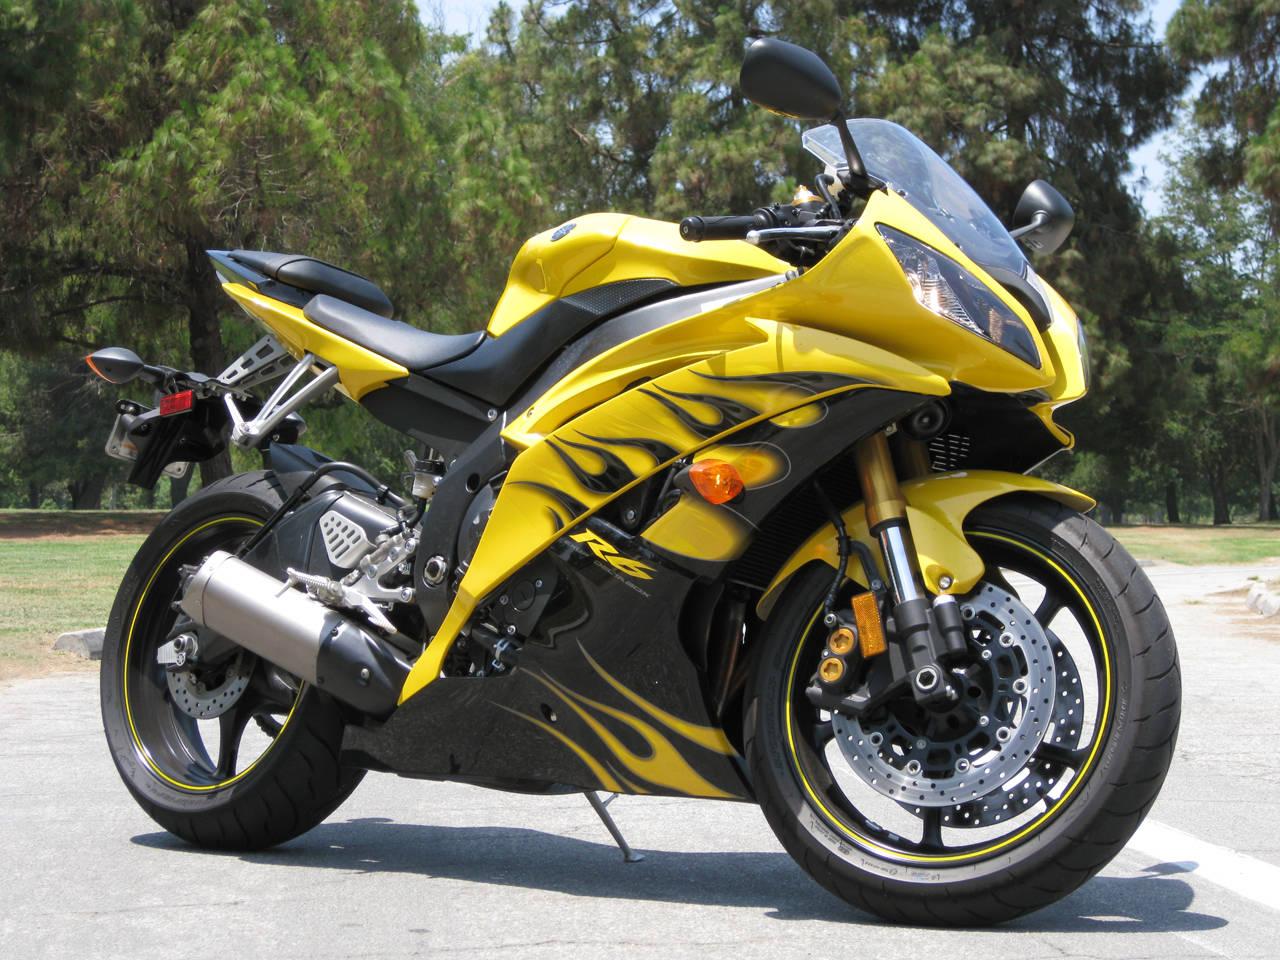 Speedy bikes yamaha motorcycles r6 for Yamaha r6 motorcycle